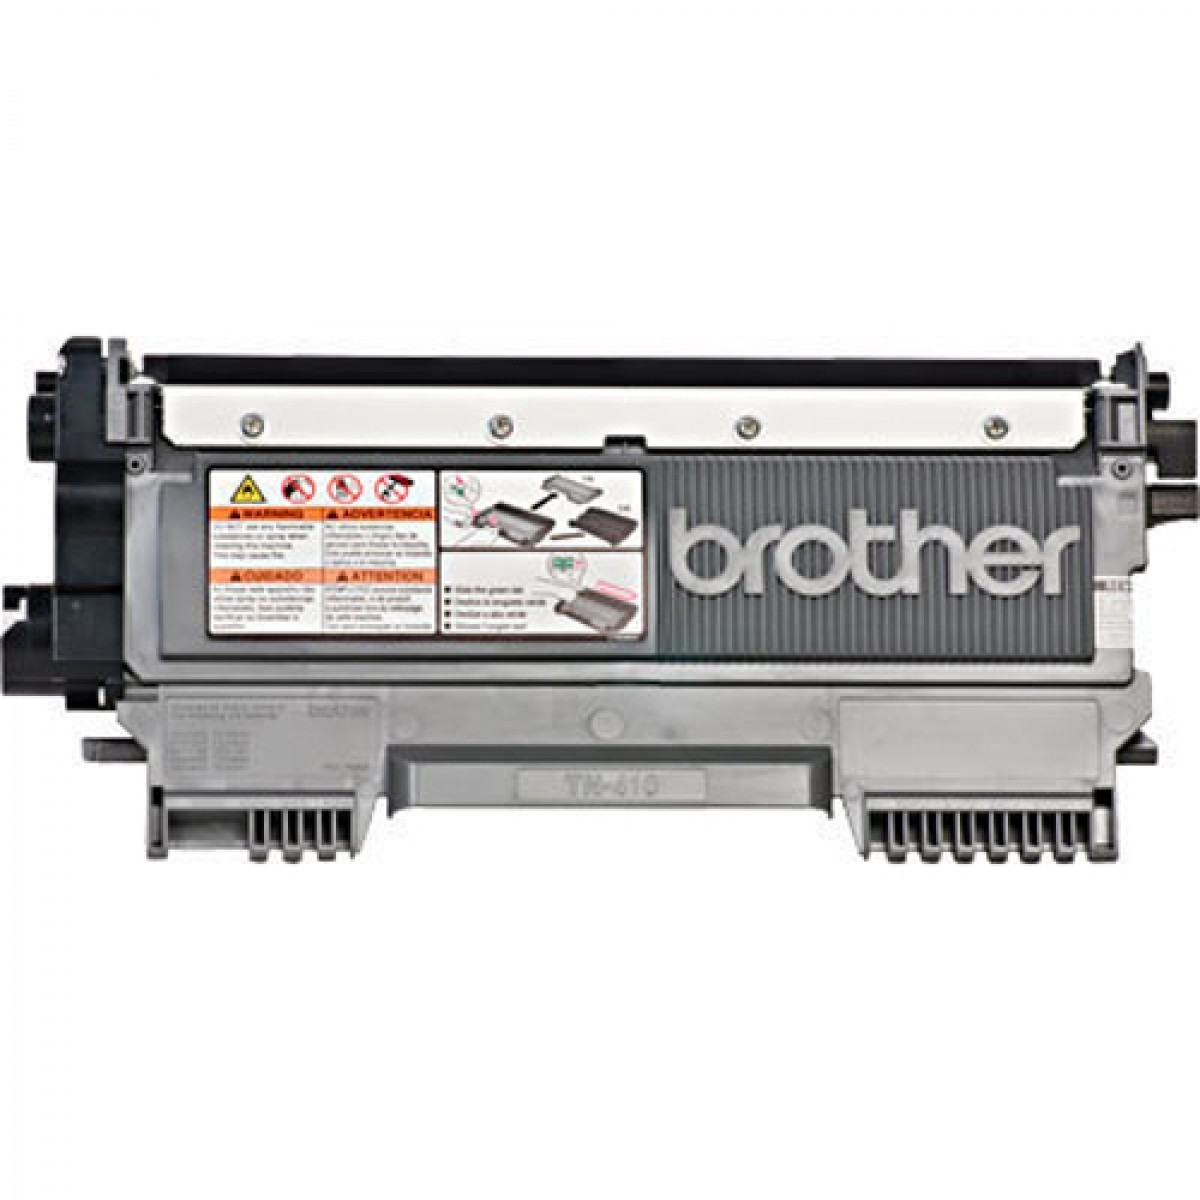 TONER BROTHER  TN 410/420/450 COMPATÍVEL  MFC-7360N, MFC-7460DN, MFC-7860DW, DCP-7060D, DCP-7065DN, HL-2220, HL-2230, HL-2240 series, HL-2270 Series, HL-2280DW